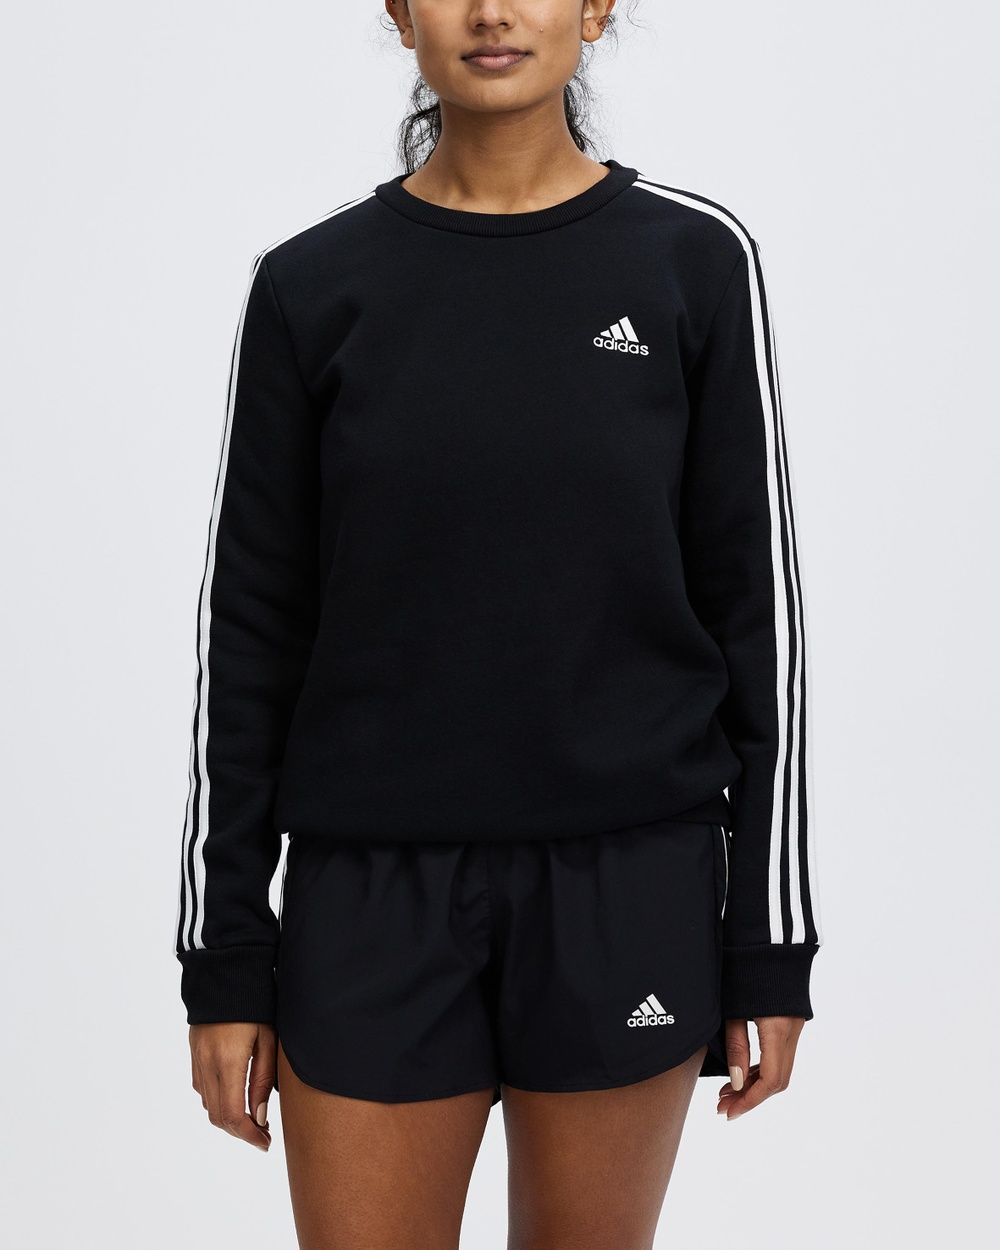 adidas Performance Essentials 3 Stripes Fleece Sweatshirt Jumpers & Cardigans Black White 3-Stripes